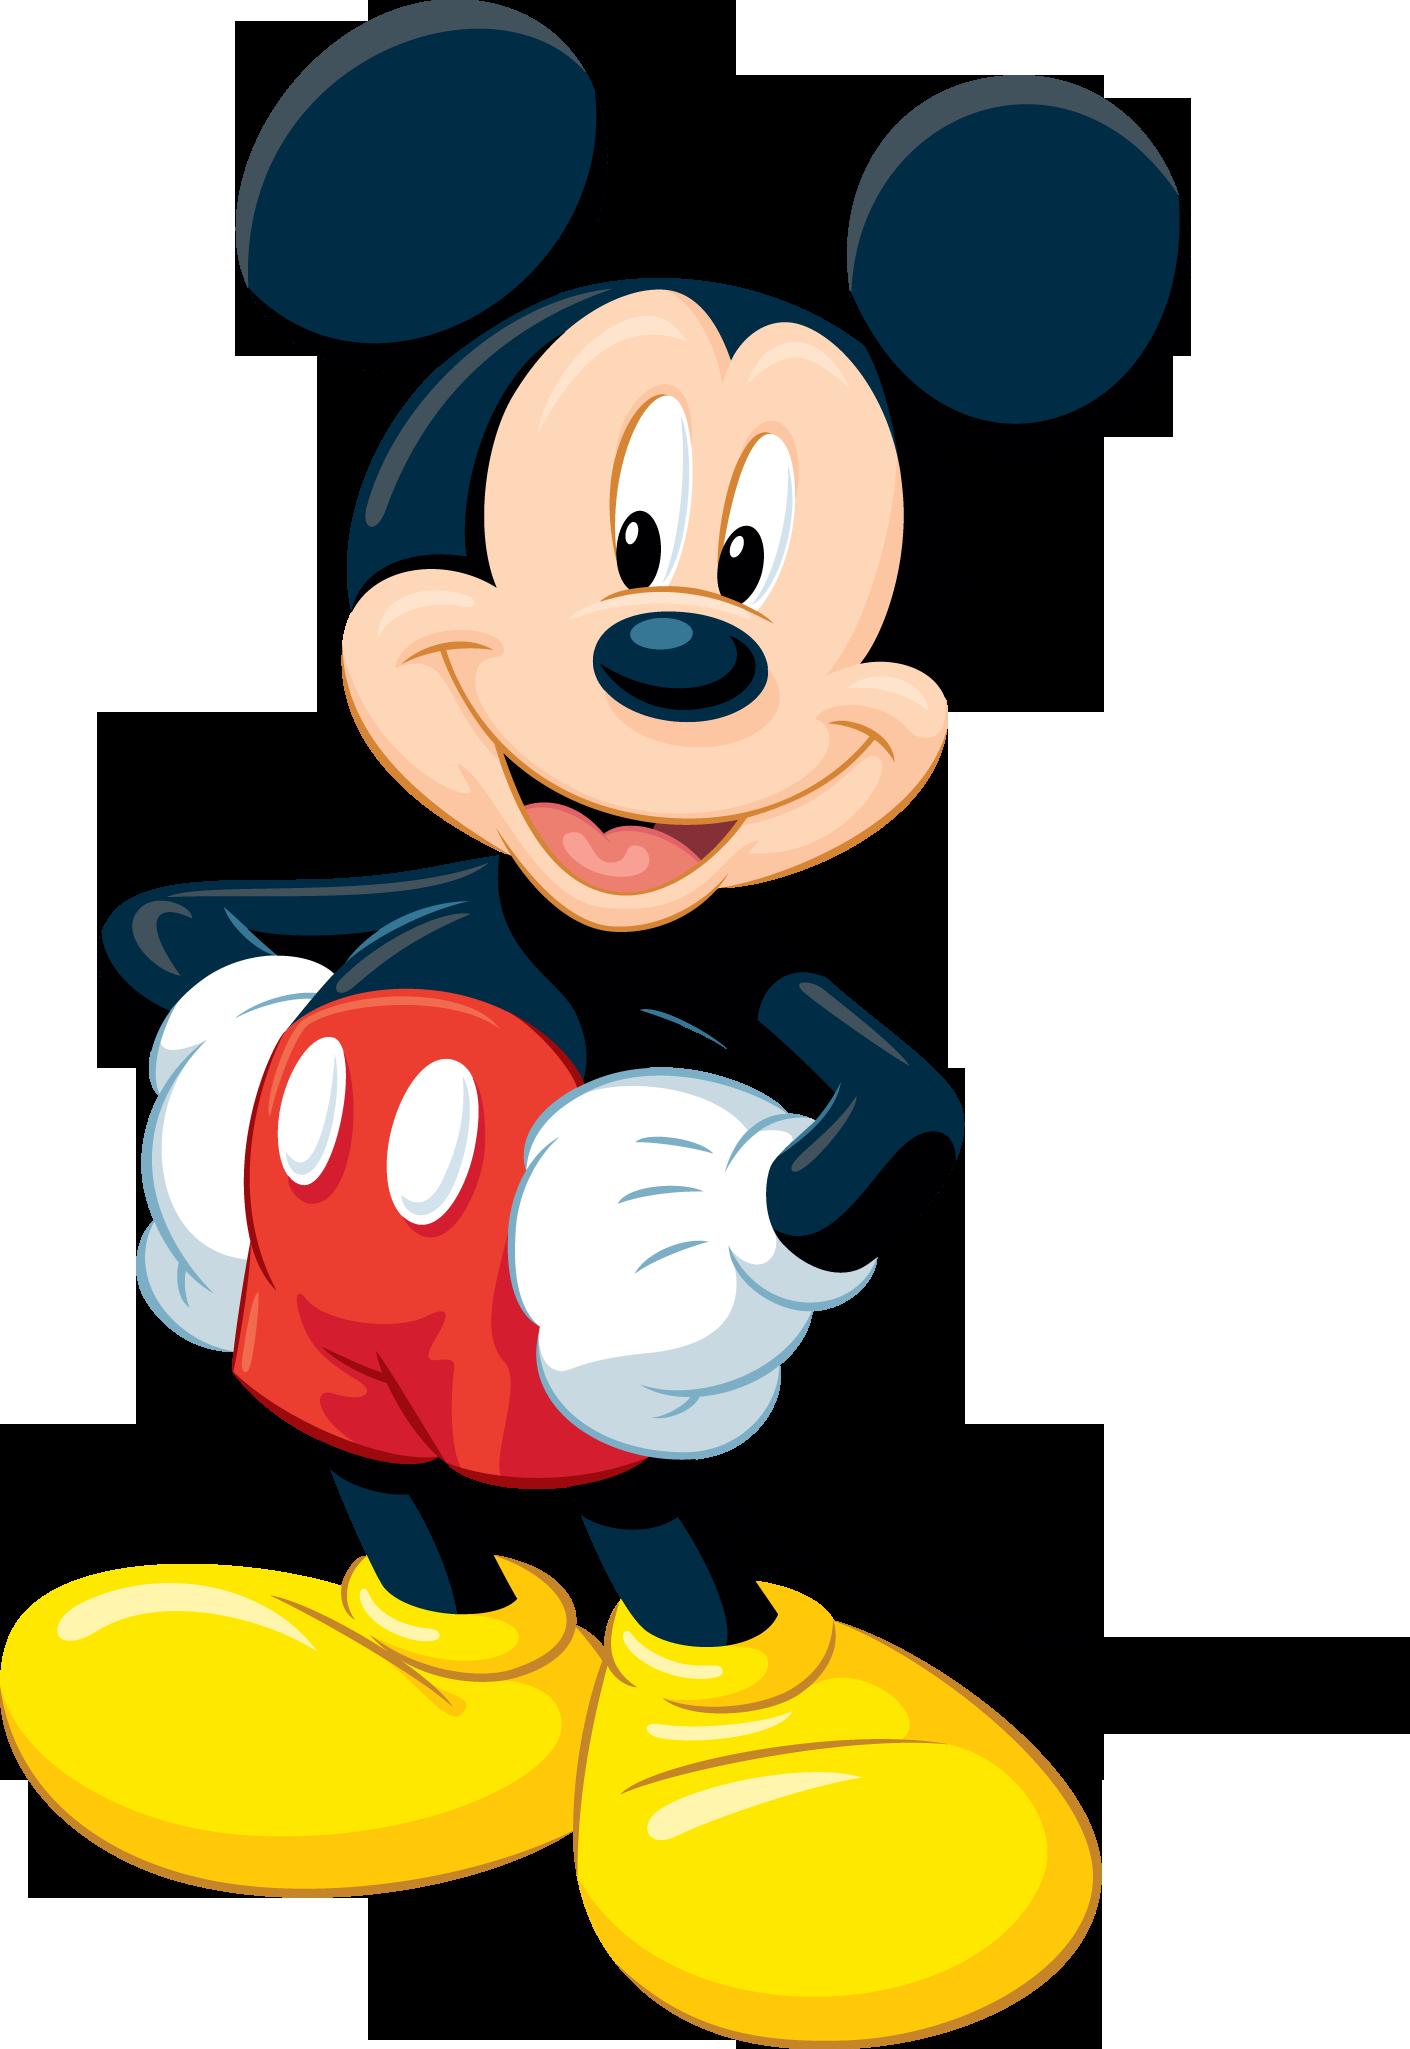 Mickey Mouse | 1st Birthday | Pinterest | Disney, Dibujos animados ... vector royalty free stock